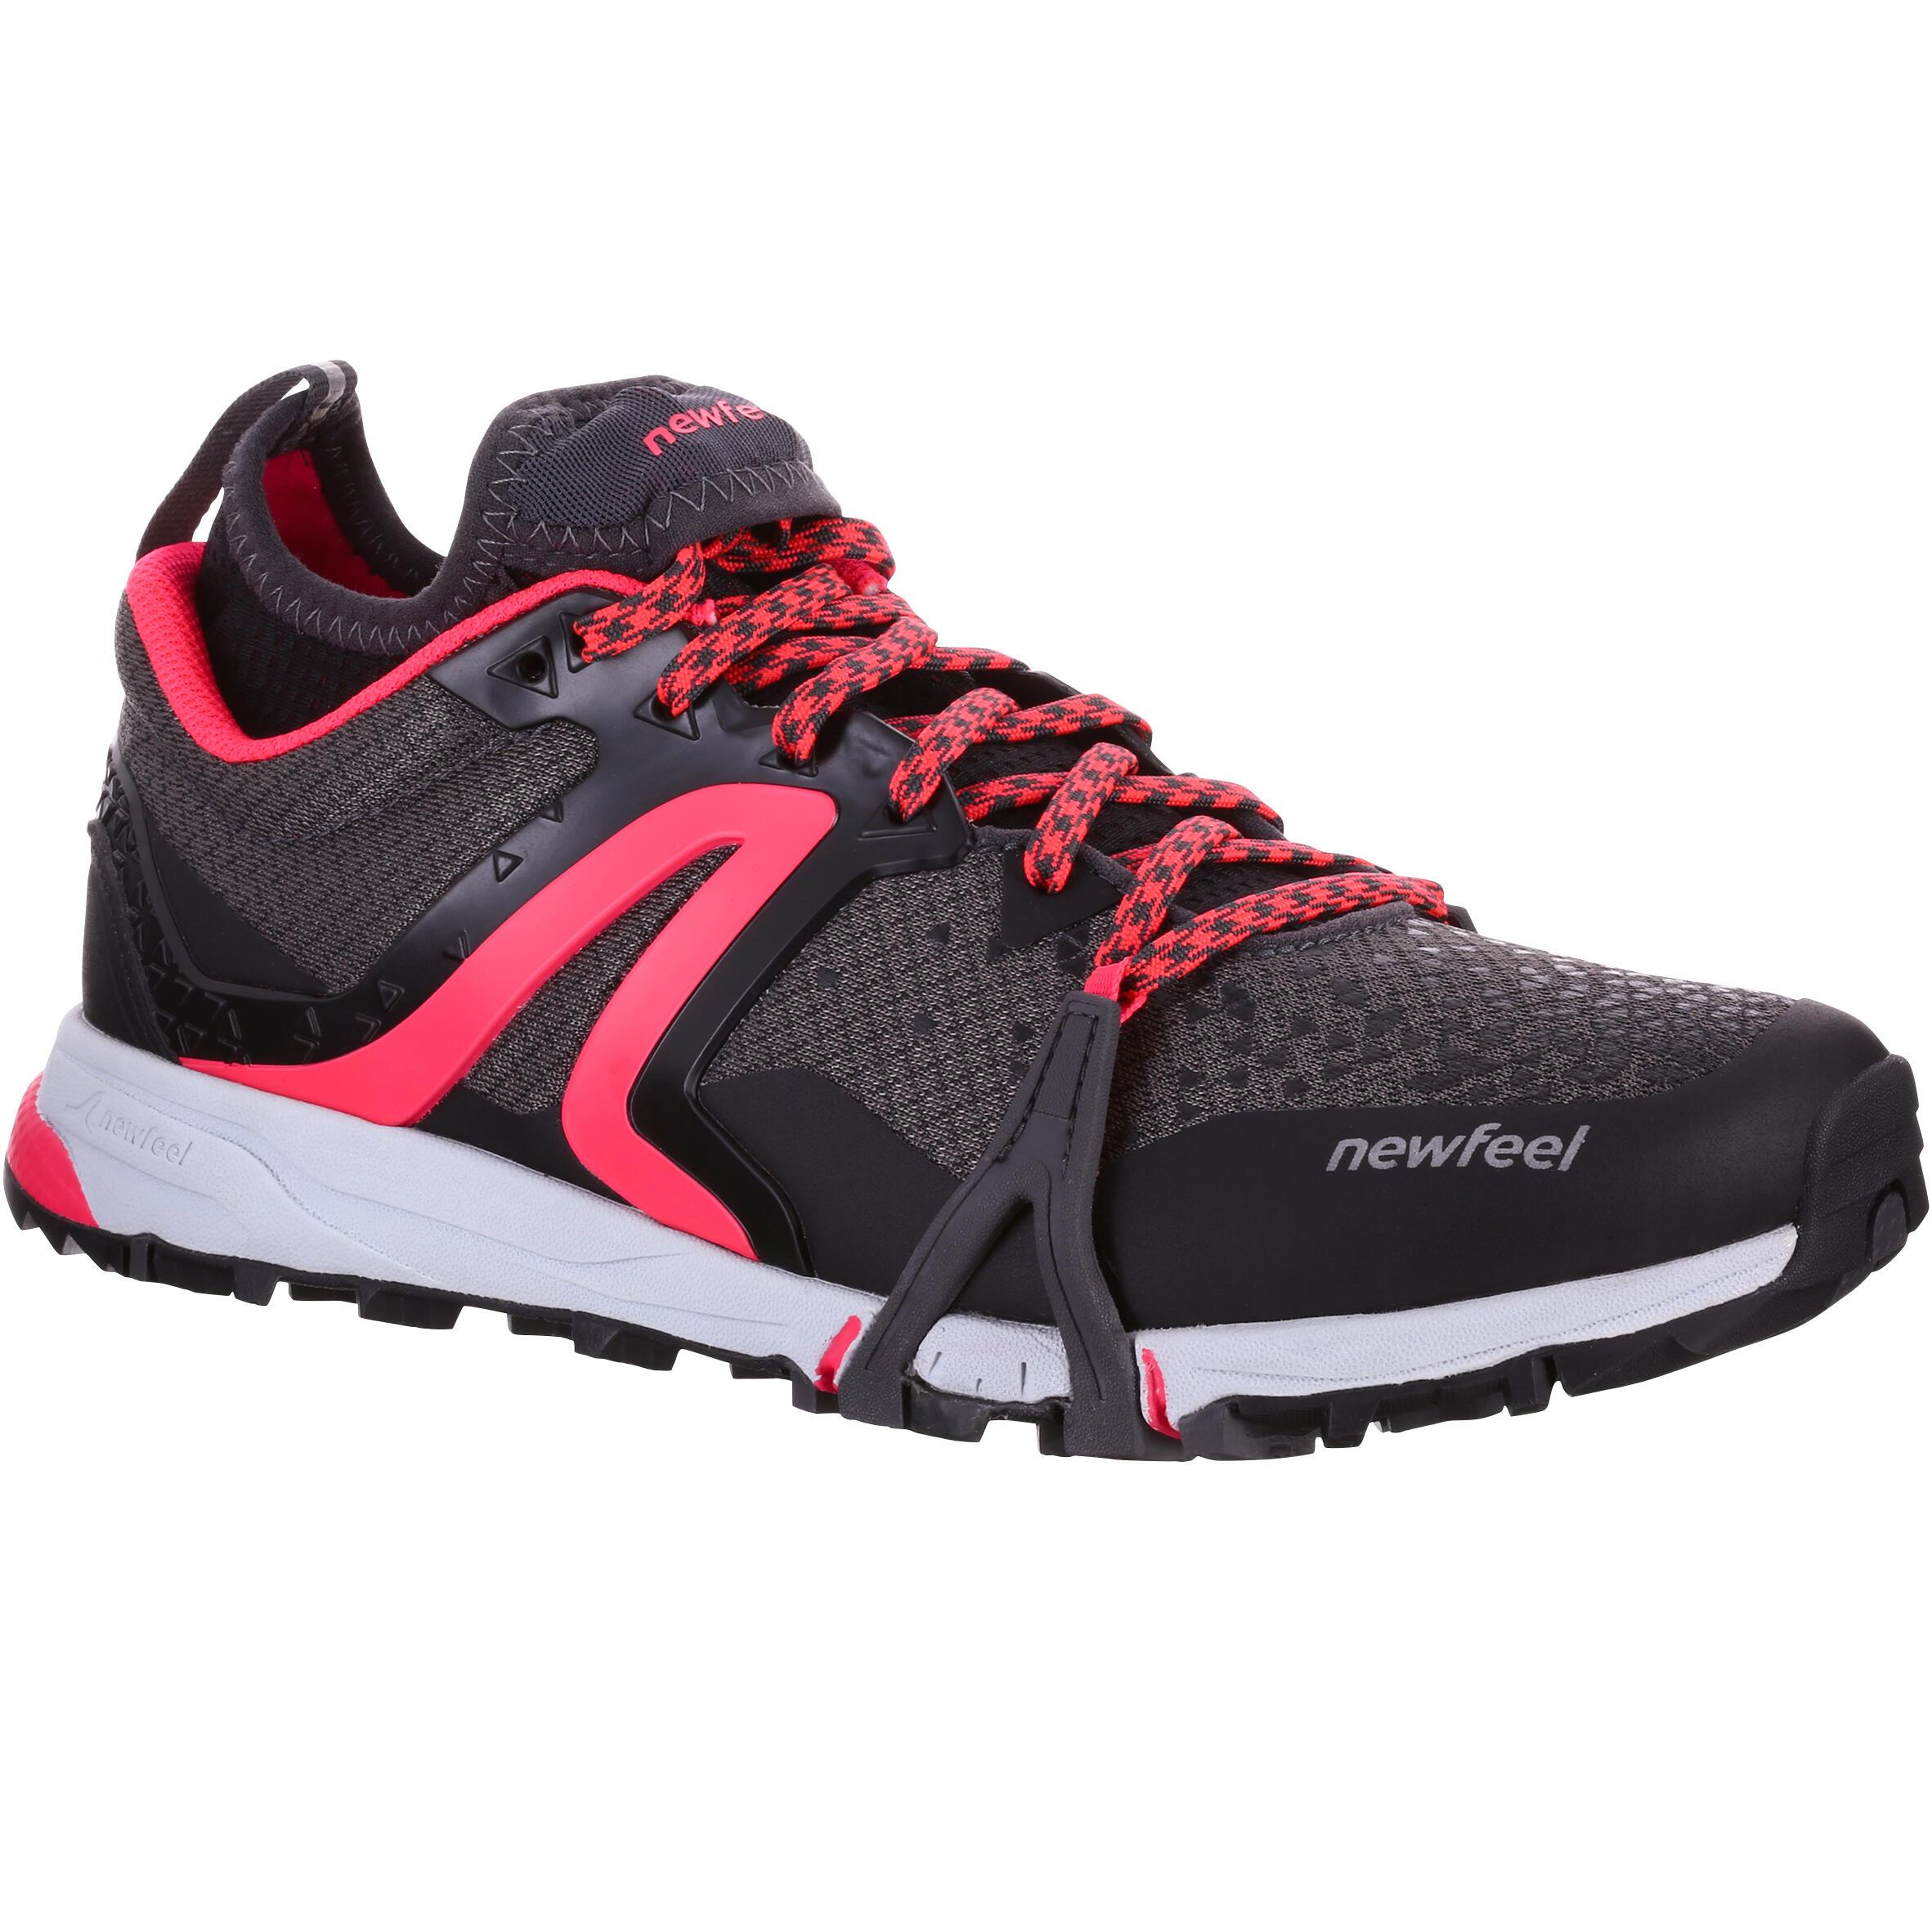 Newfeel Chaussures de marche nordique femme NW 900 Flex-H noir / rose - Newfeel